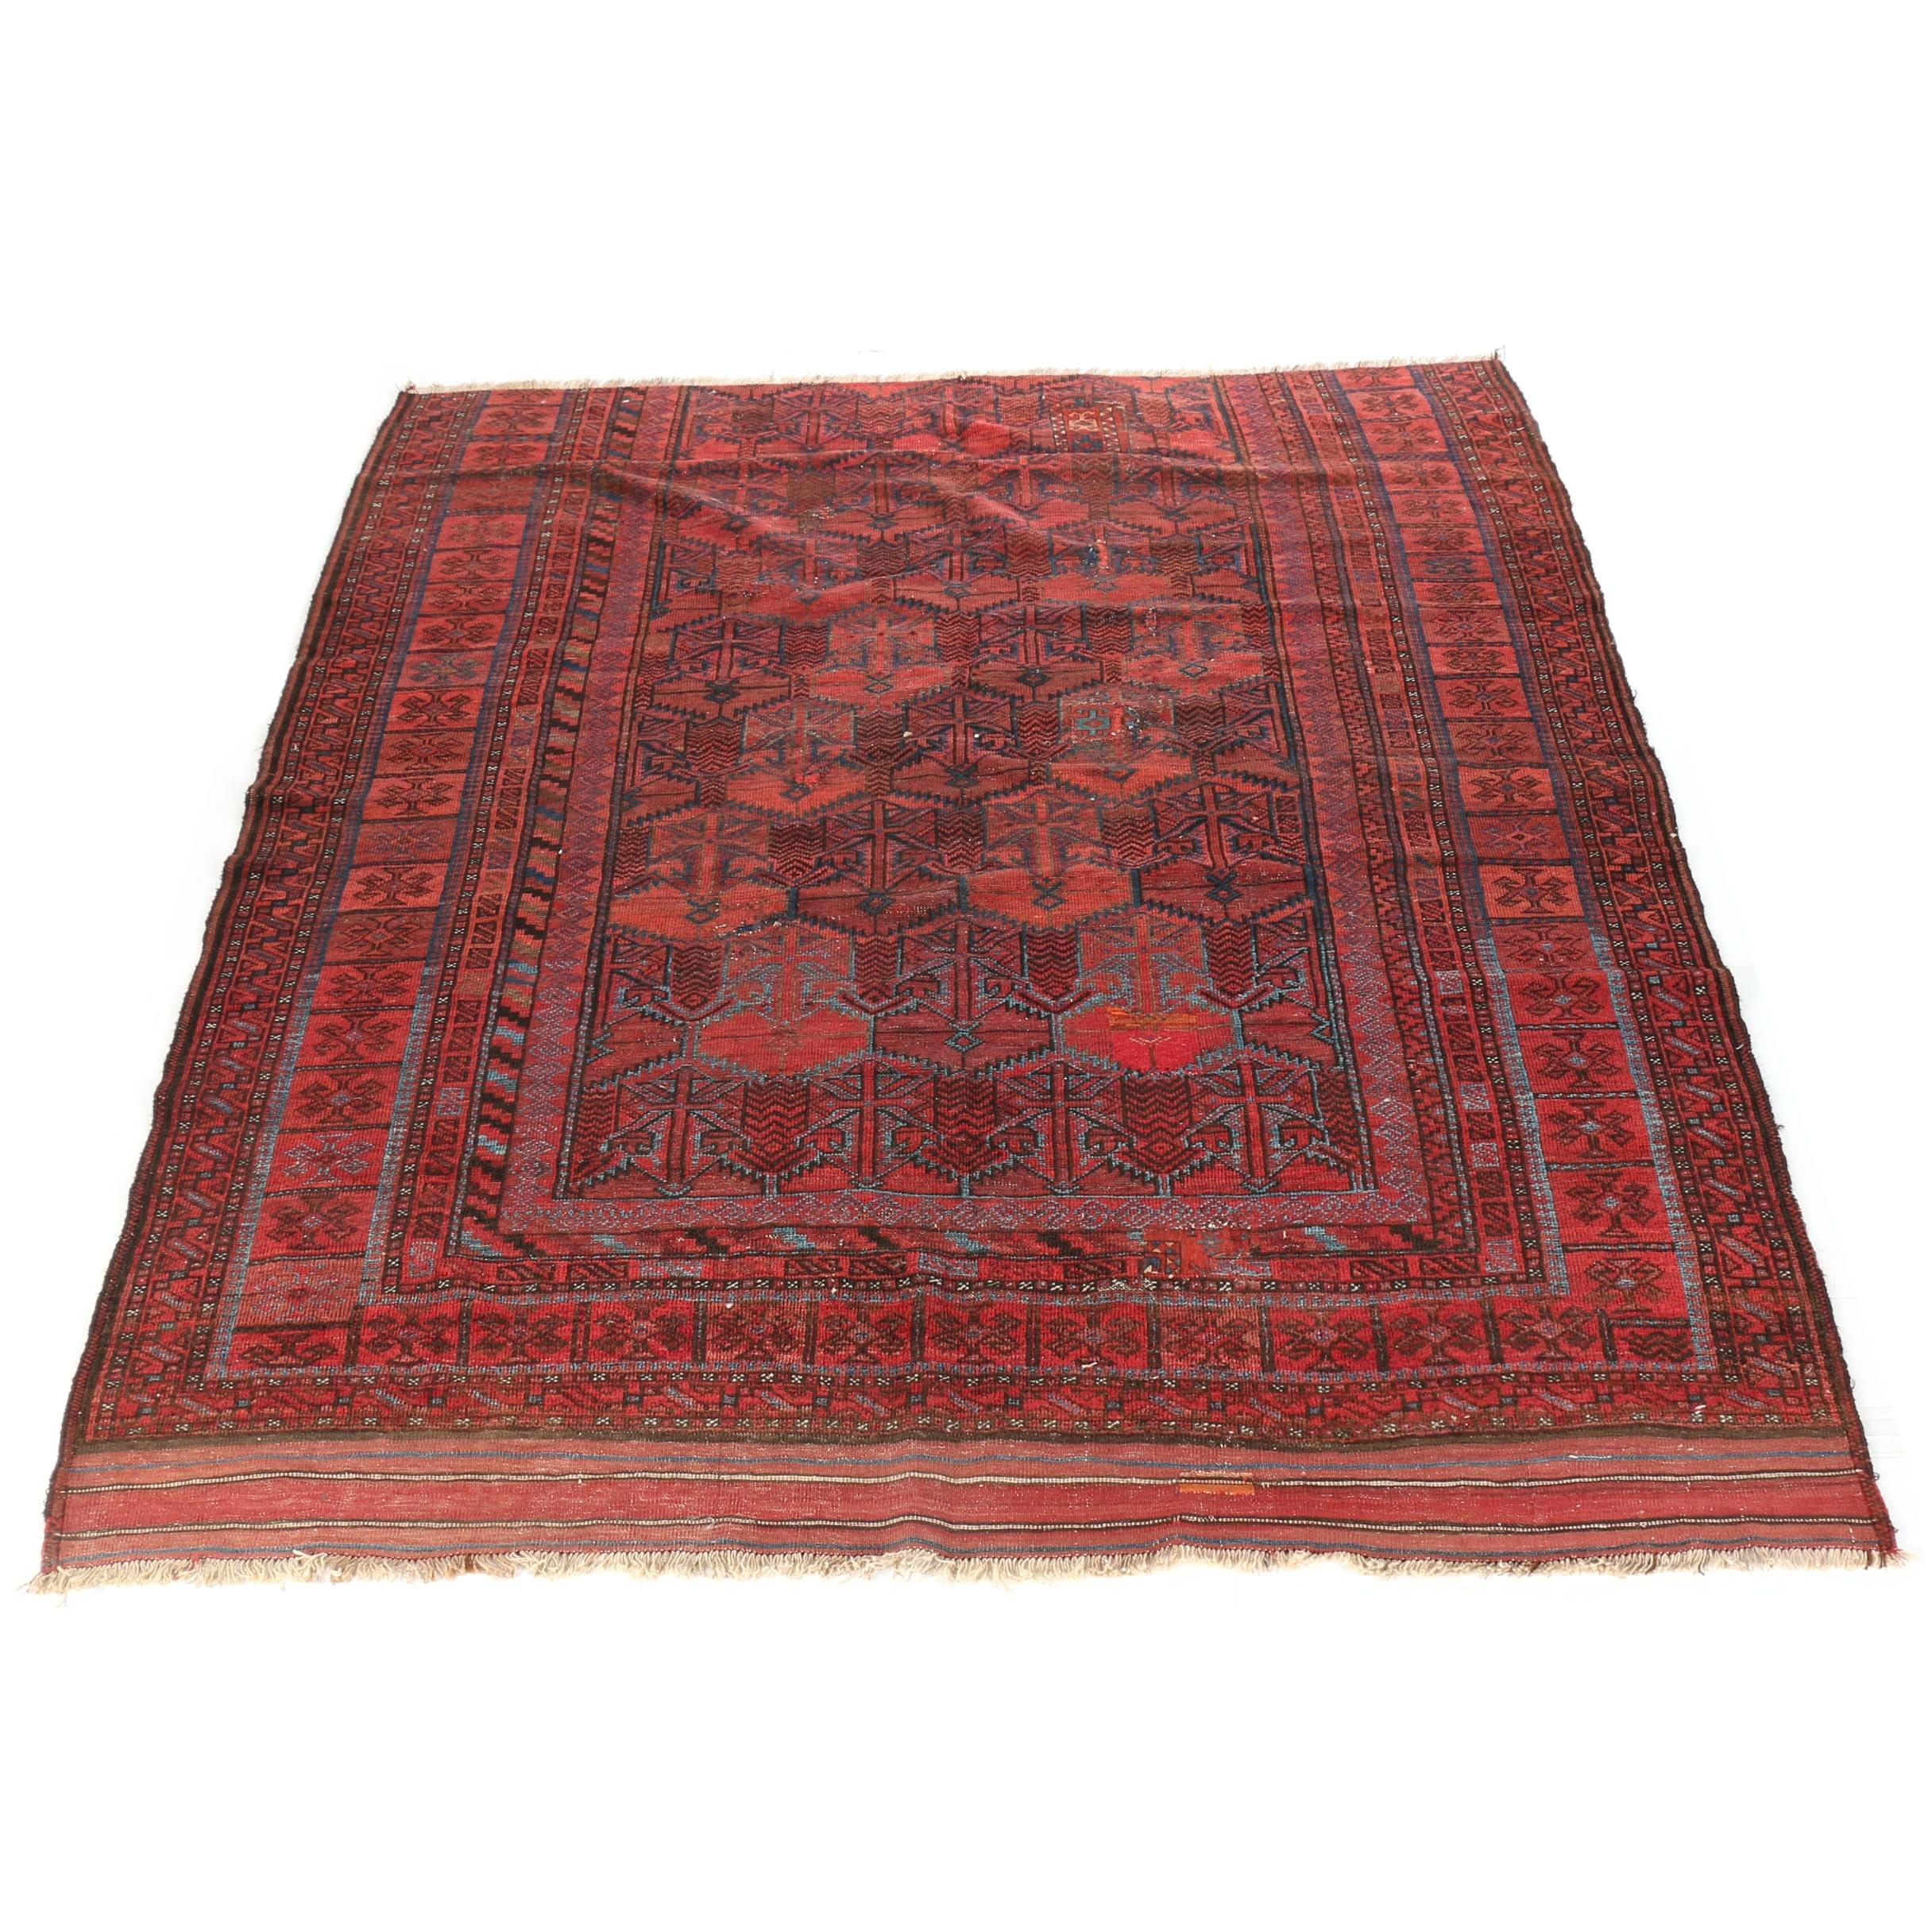 Handwoven Geometric Tapestry